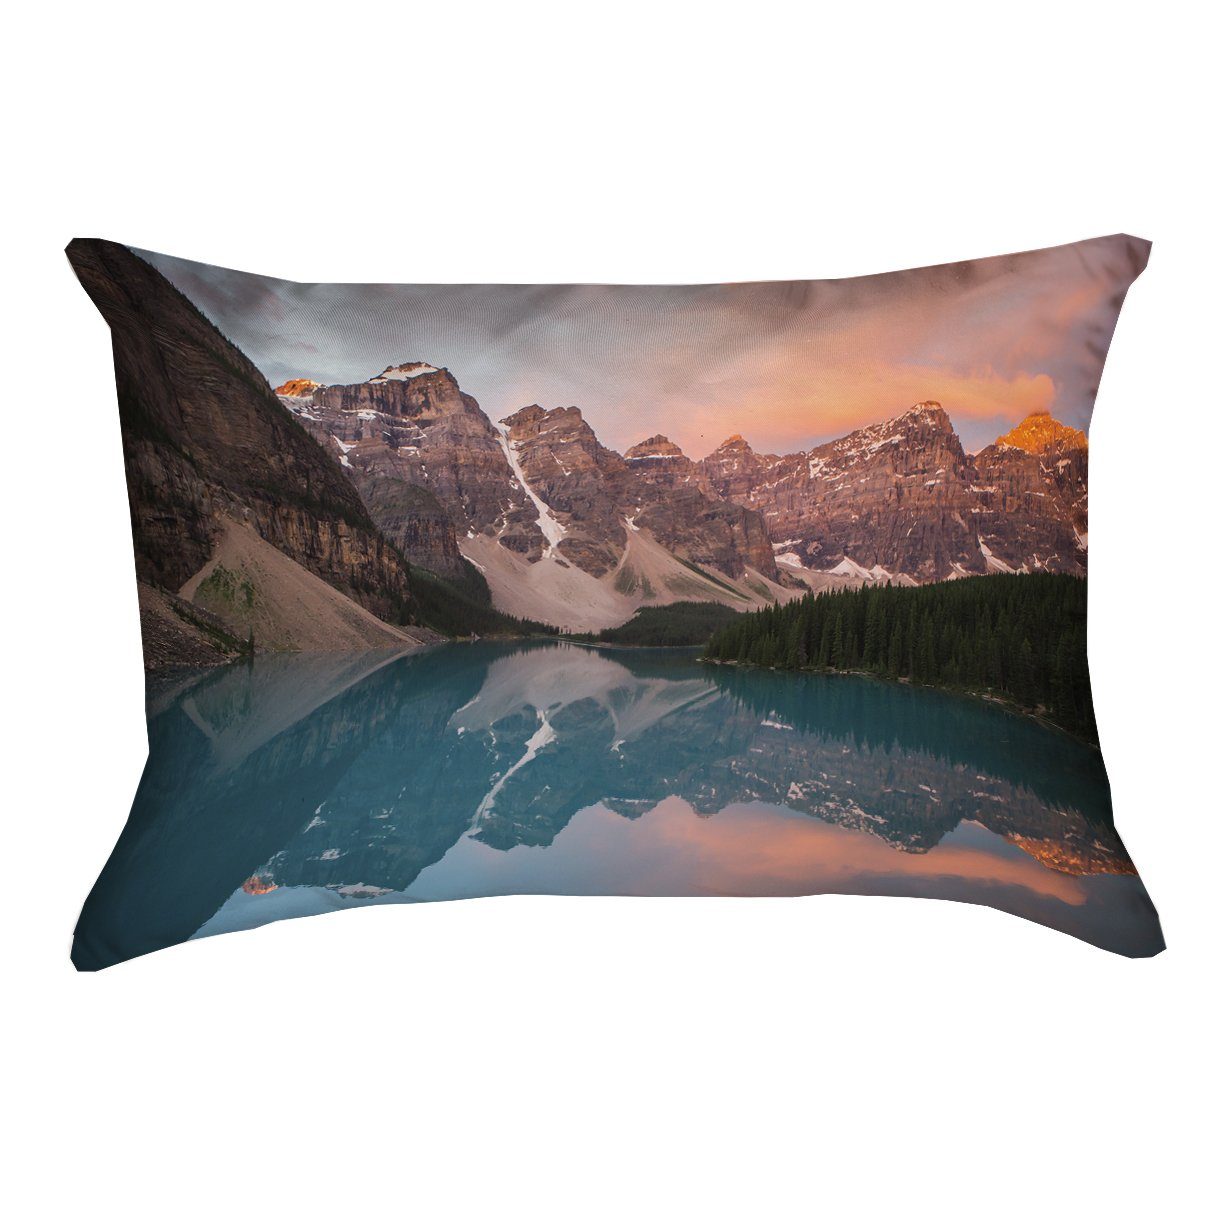 ArtVerse Garrett Parker 14 x 20 Indoor//Outdoor UV Properties-Waterproof and Mildew Proof Valley and Mountains at Sunset Pillow